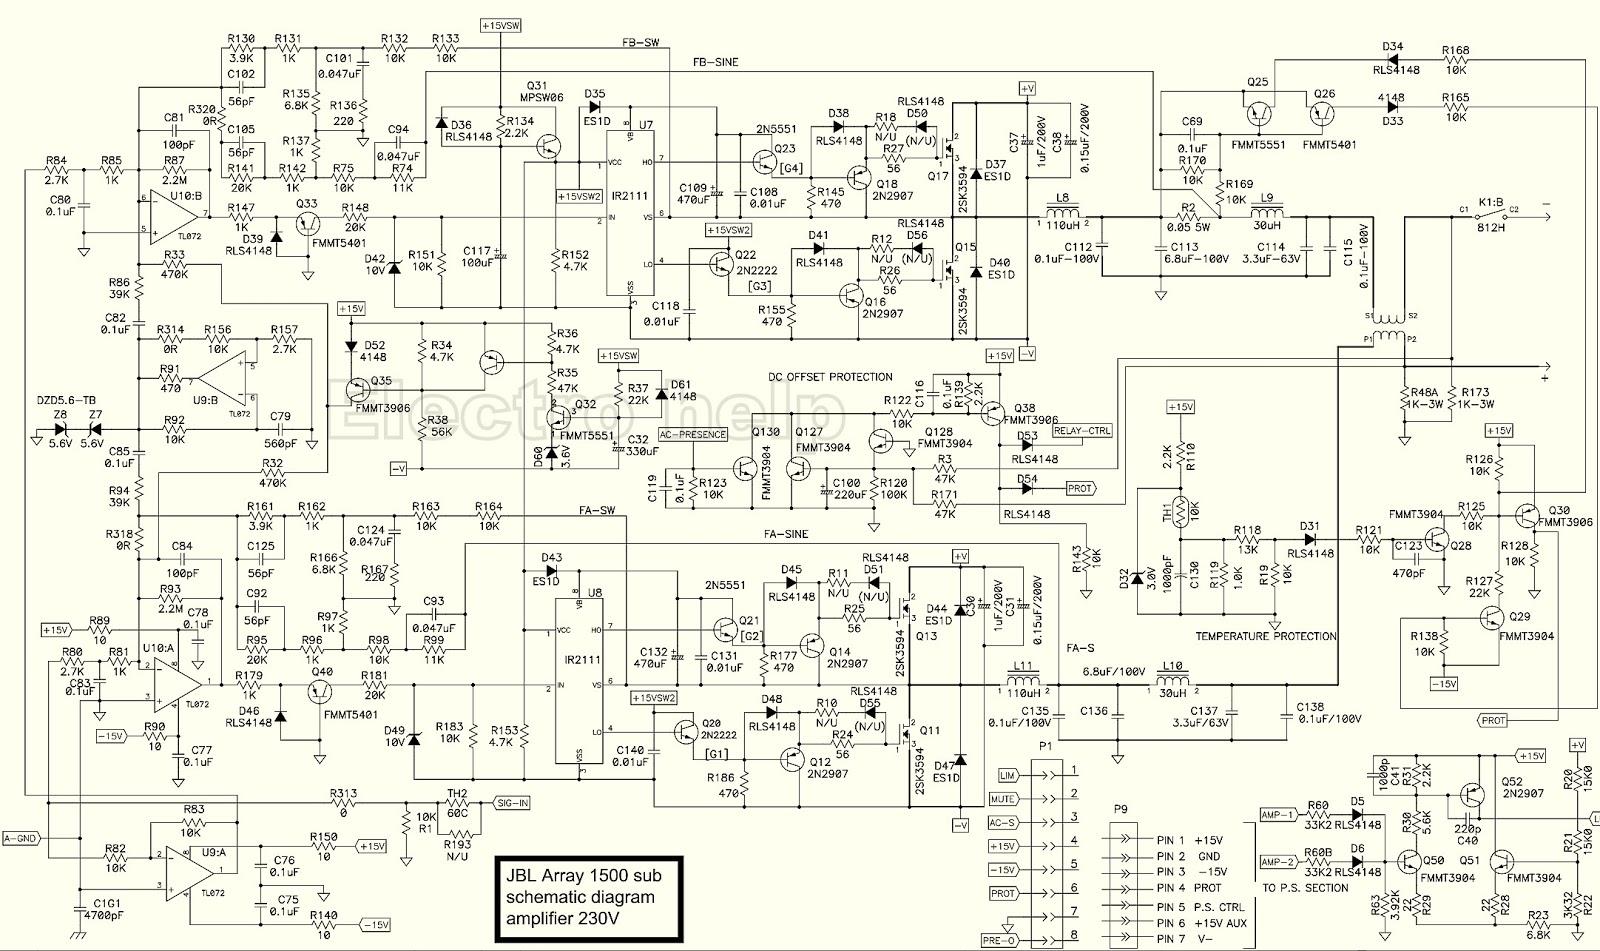 Electro Help  Jbl 1500 Array Schematic